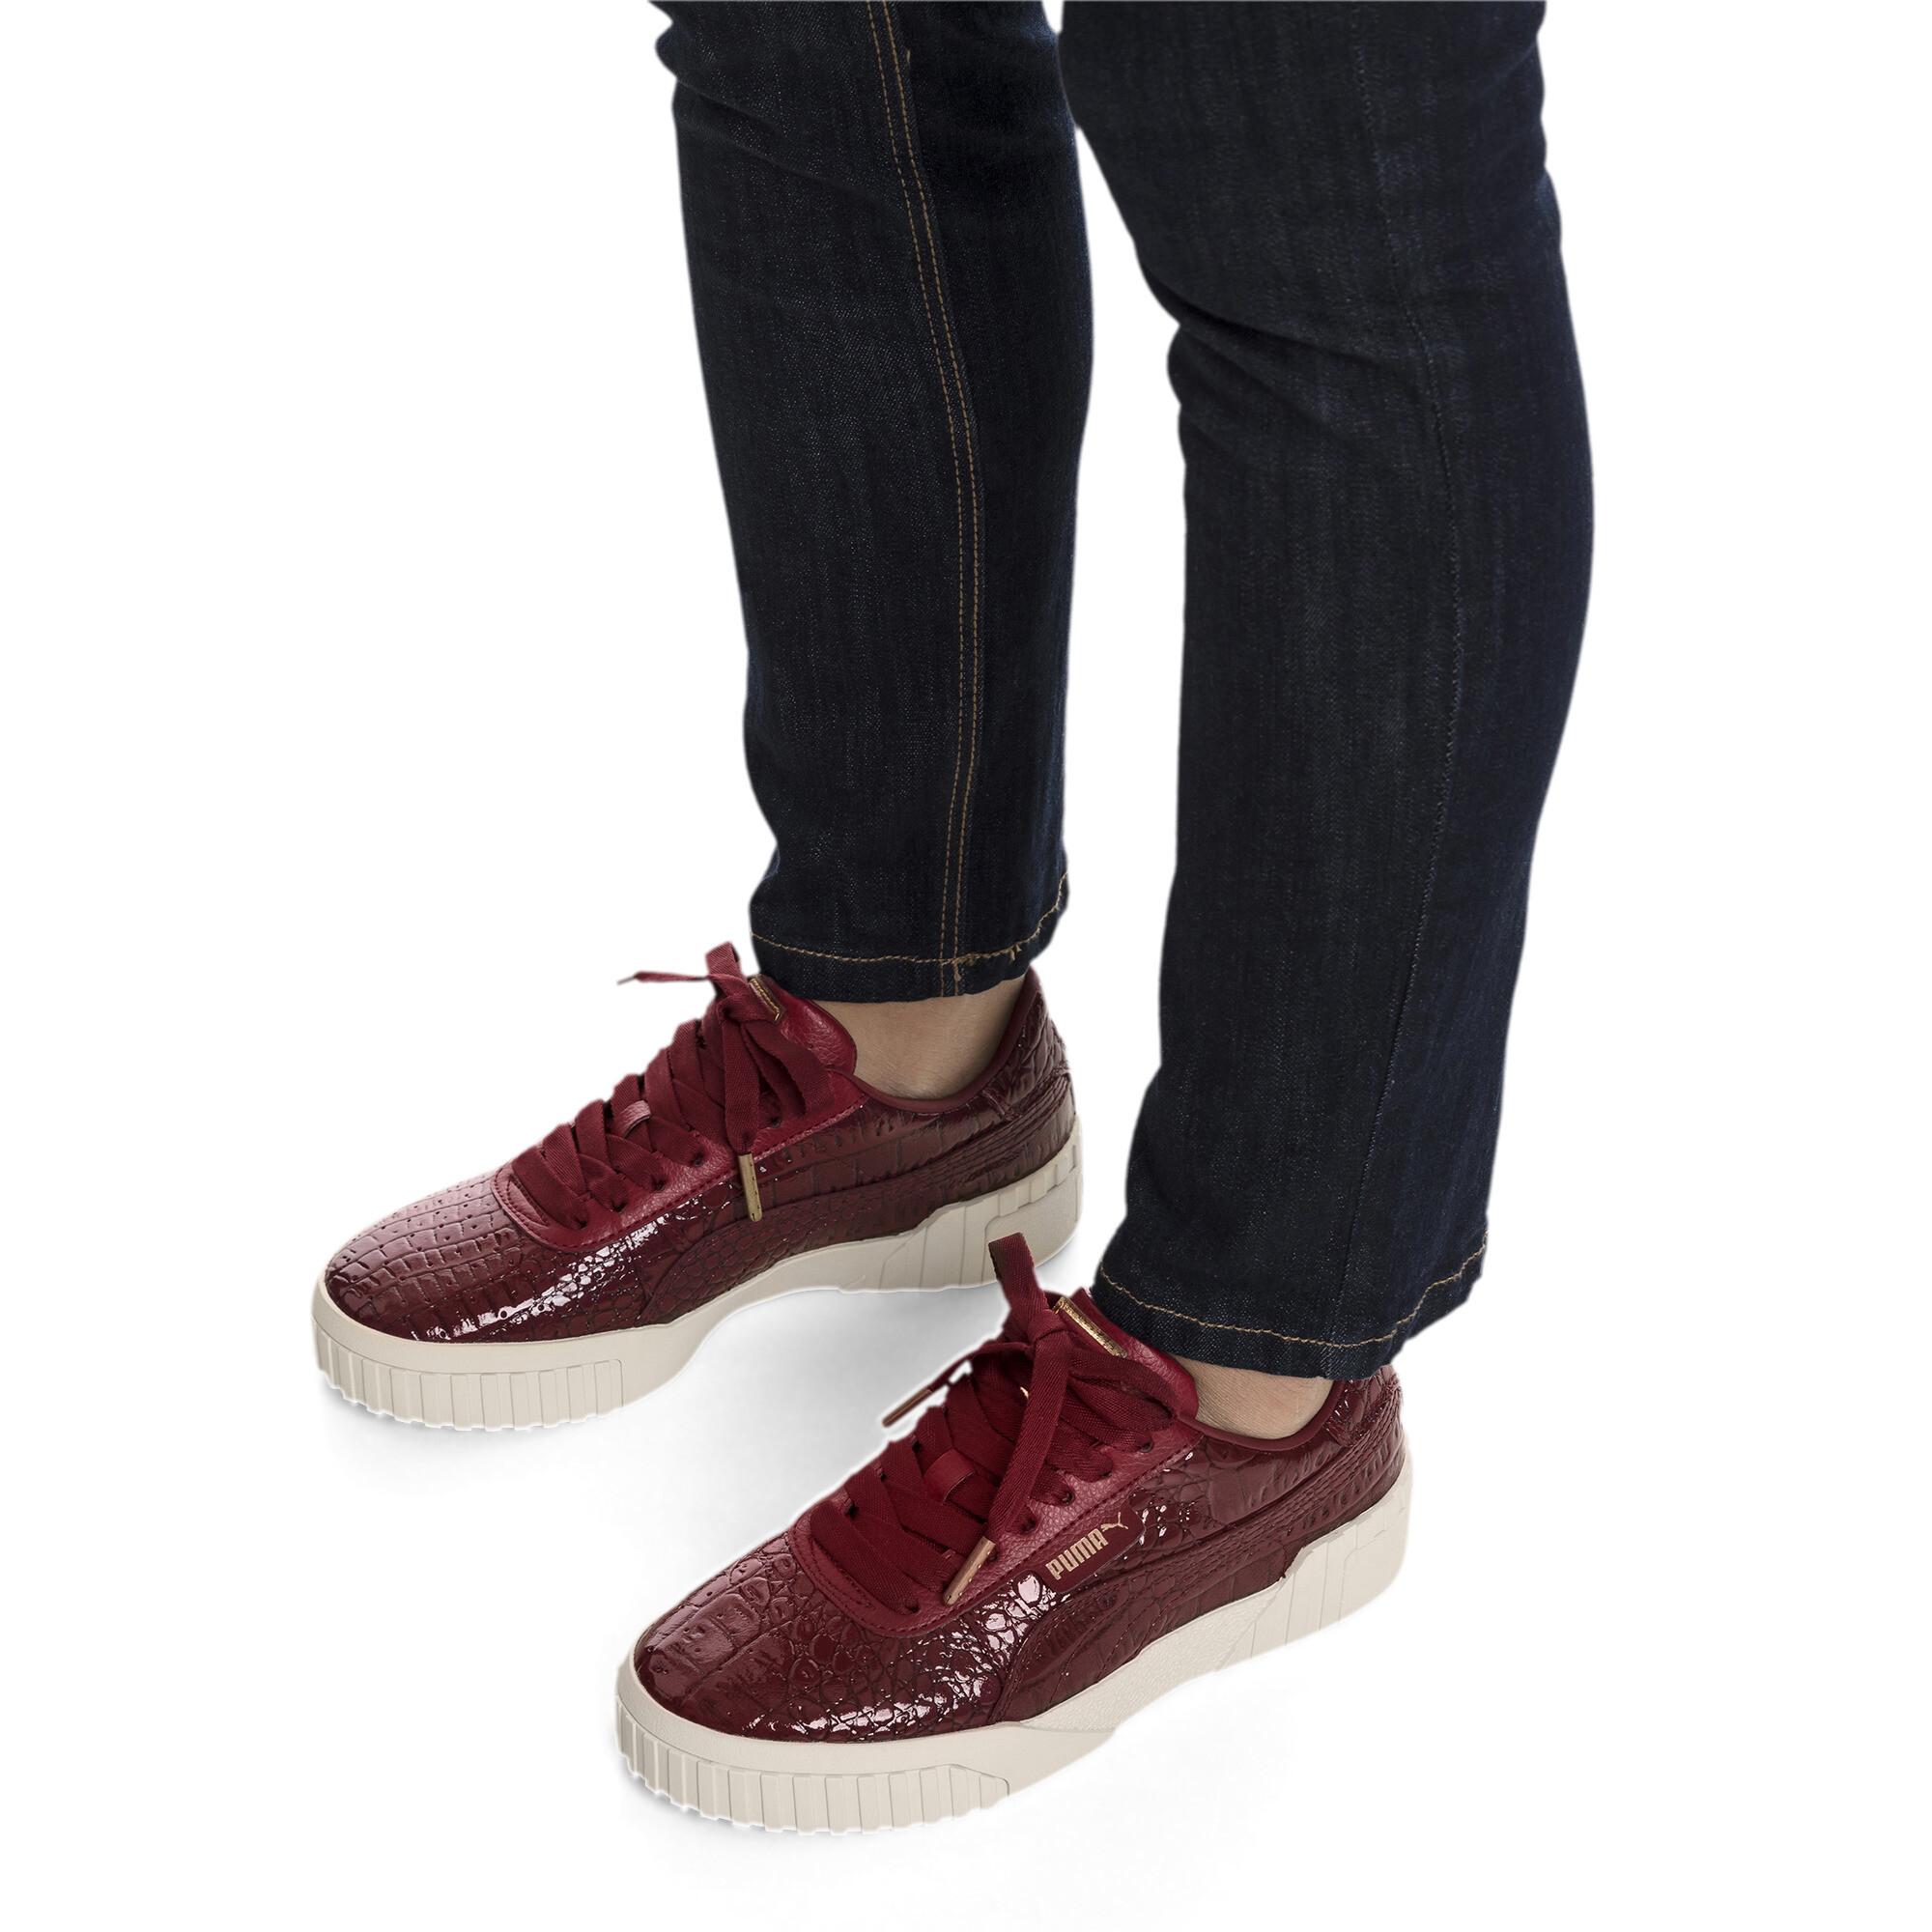 Image Puma Cali Croc Women's Sneakers #2